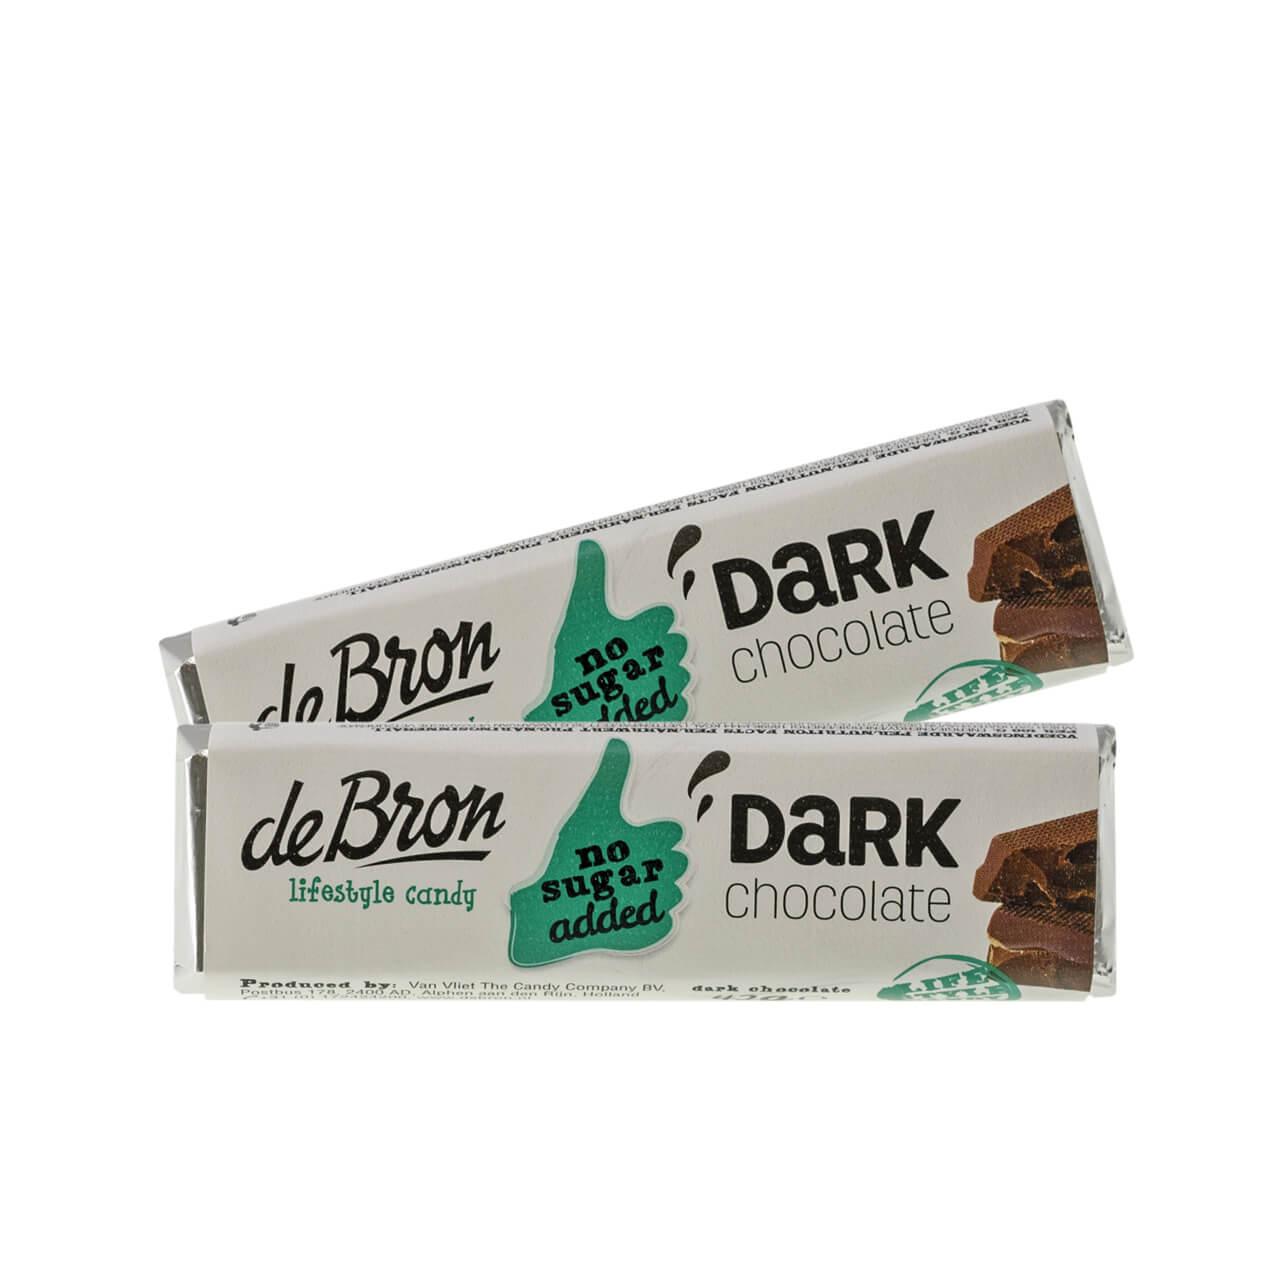 De Bron Low Carb Schokoriegel Zartbitter 42 g. Zuckerfreie Schokolade, Low Carb Schokolade kaufen.